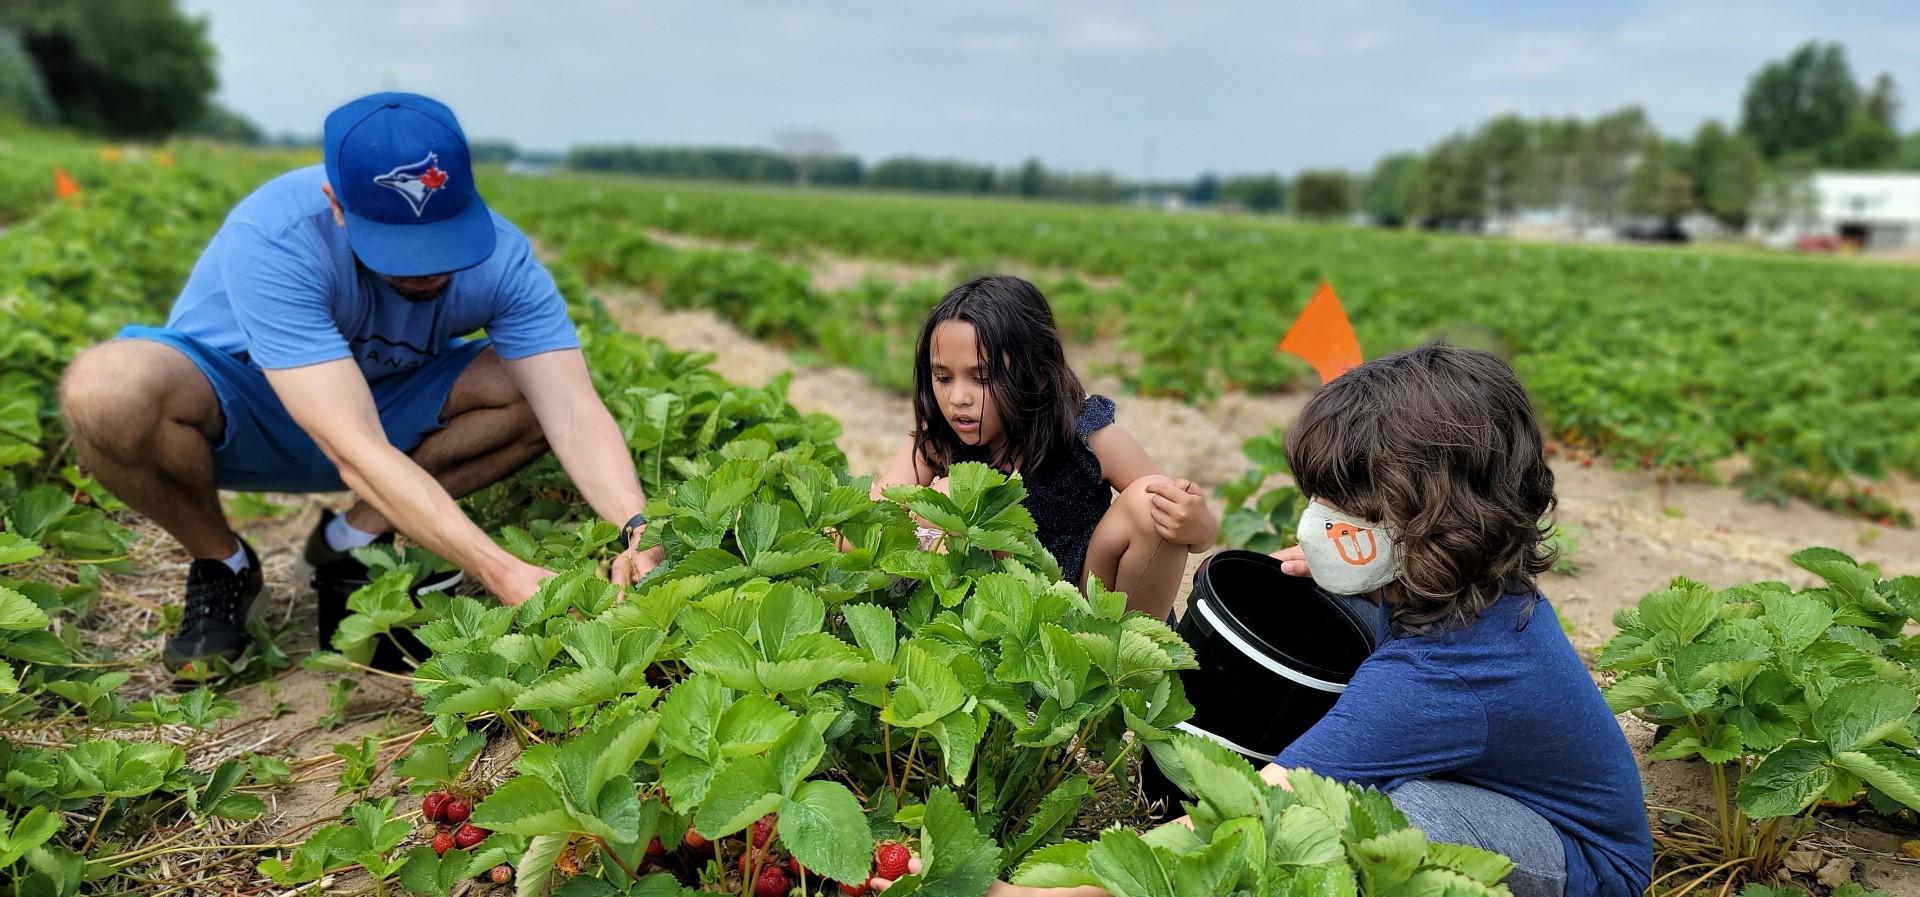 family picking strawberries